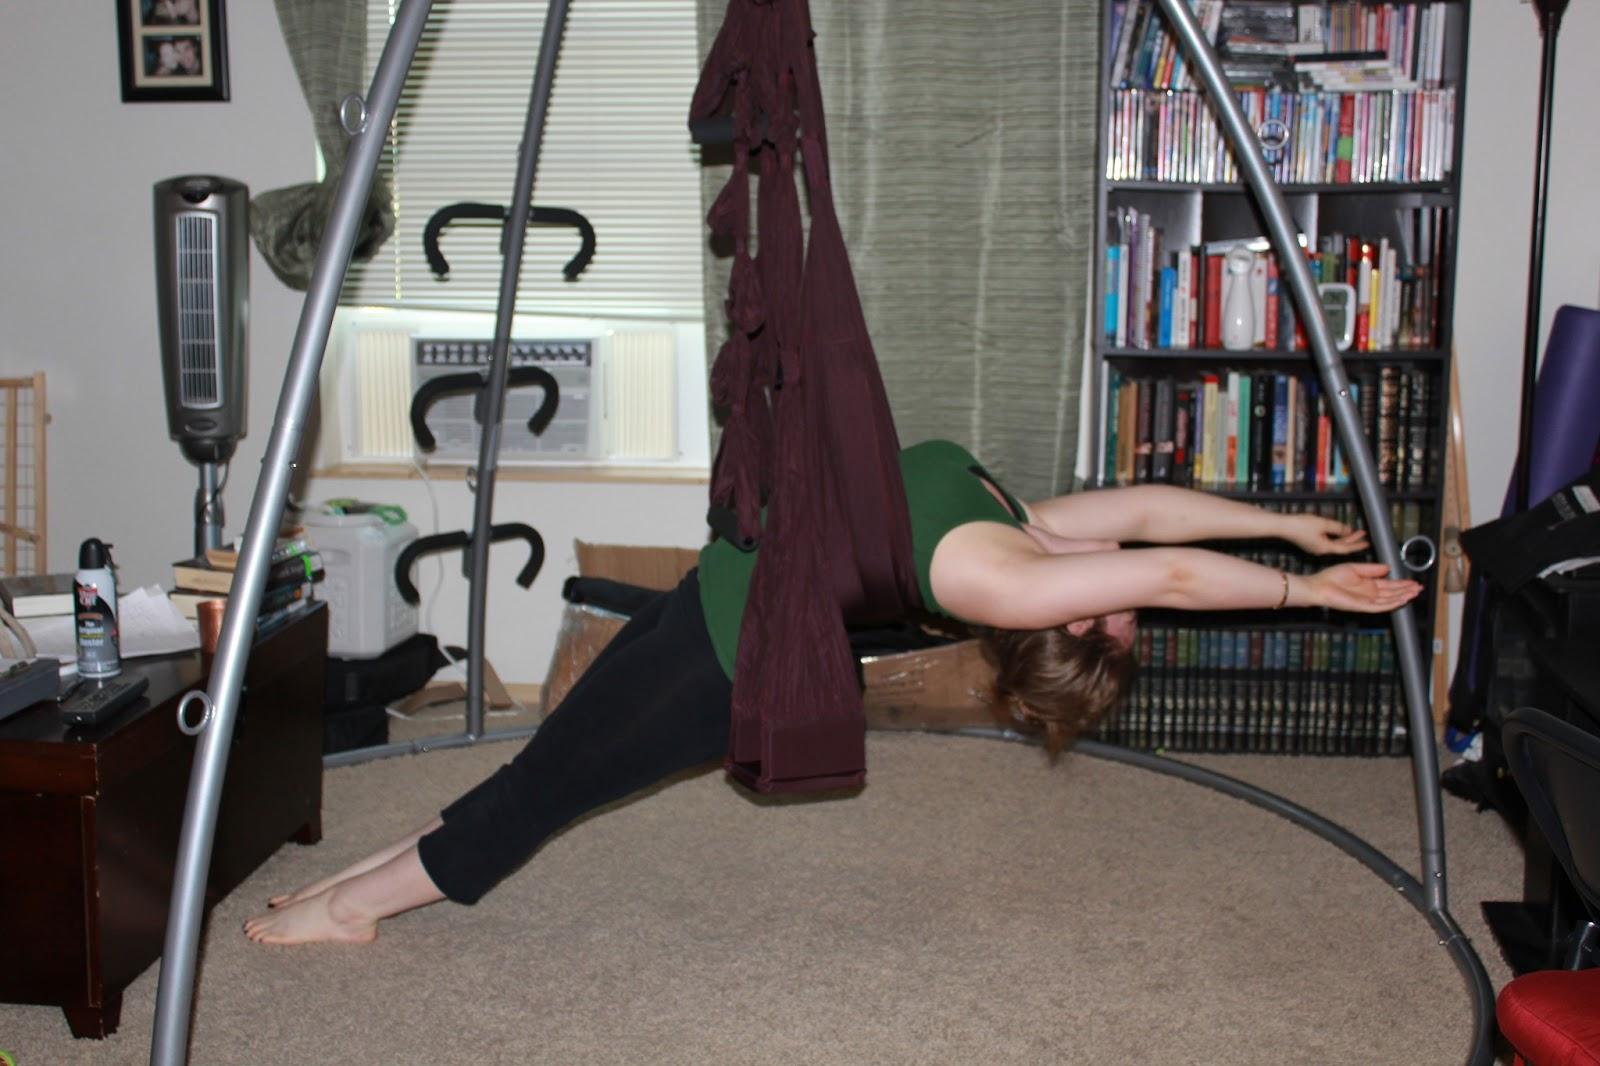 Femtastic Dance Omni Gym Aerial Yoga And Lyra Oh My